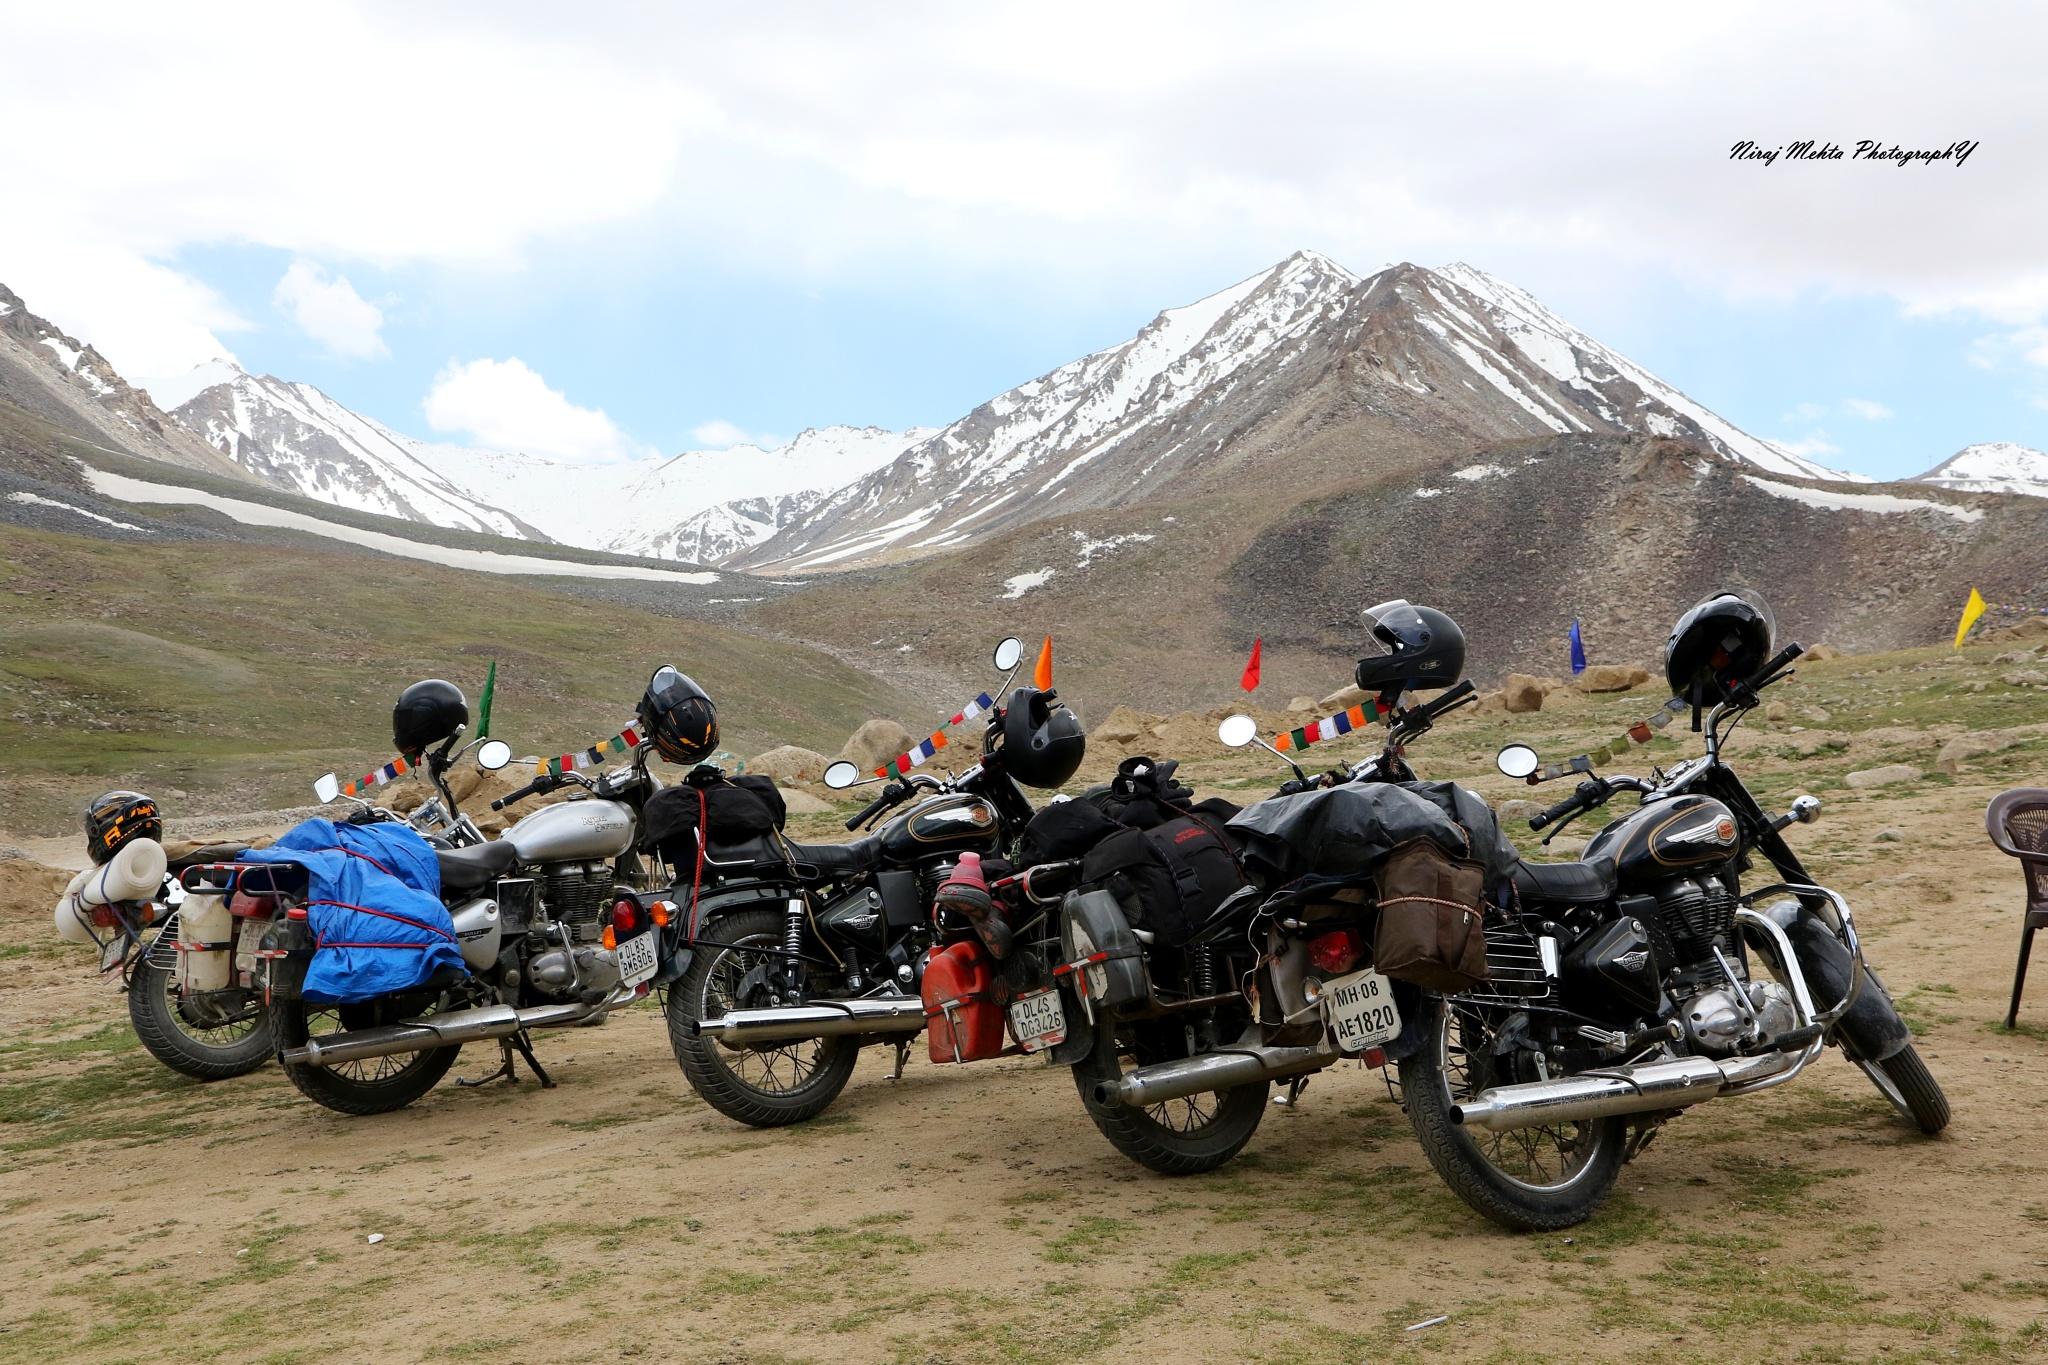 Our Bikes @ Leh Ladakh............. by NIRAJ MEHTA